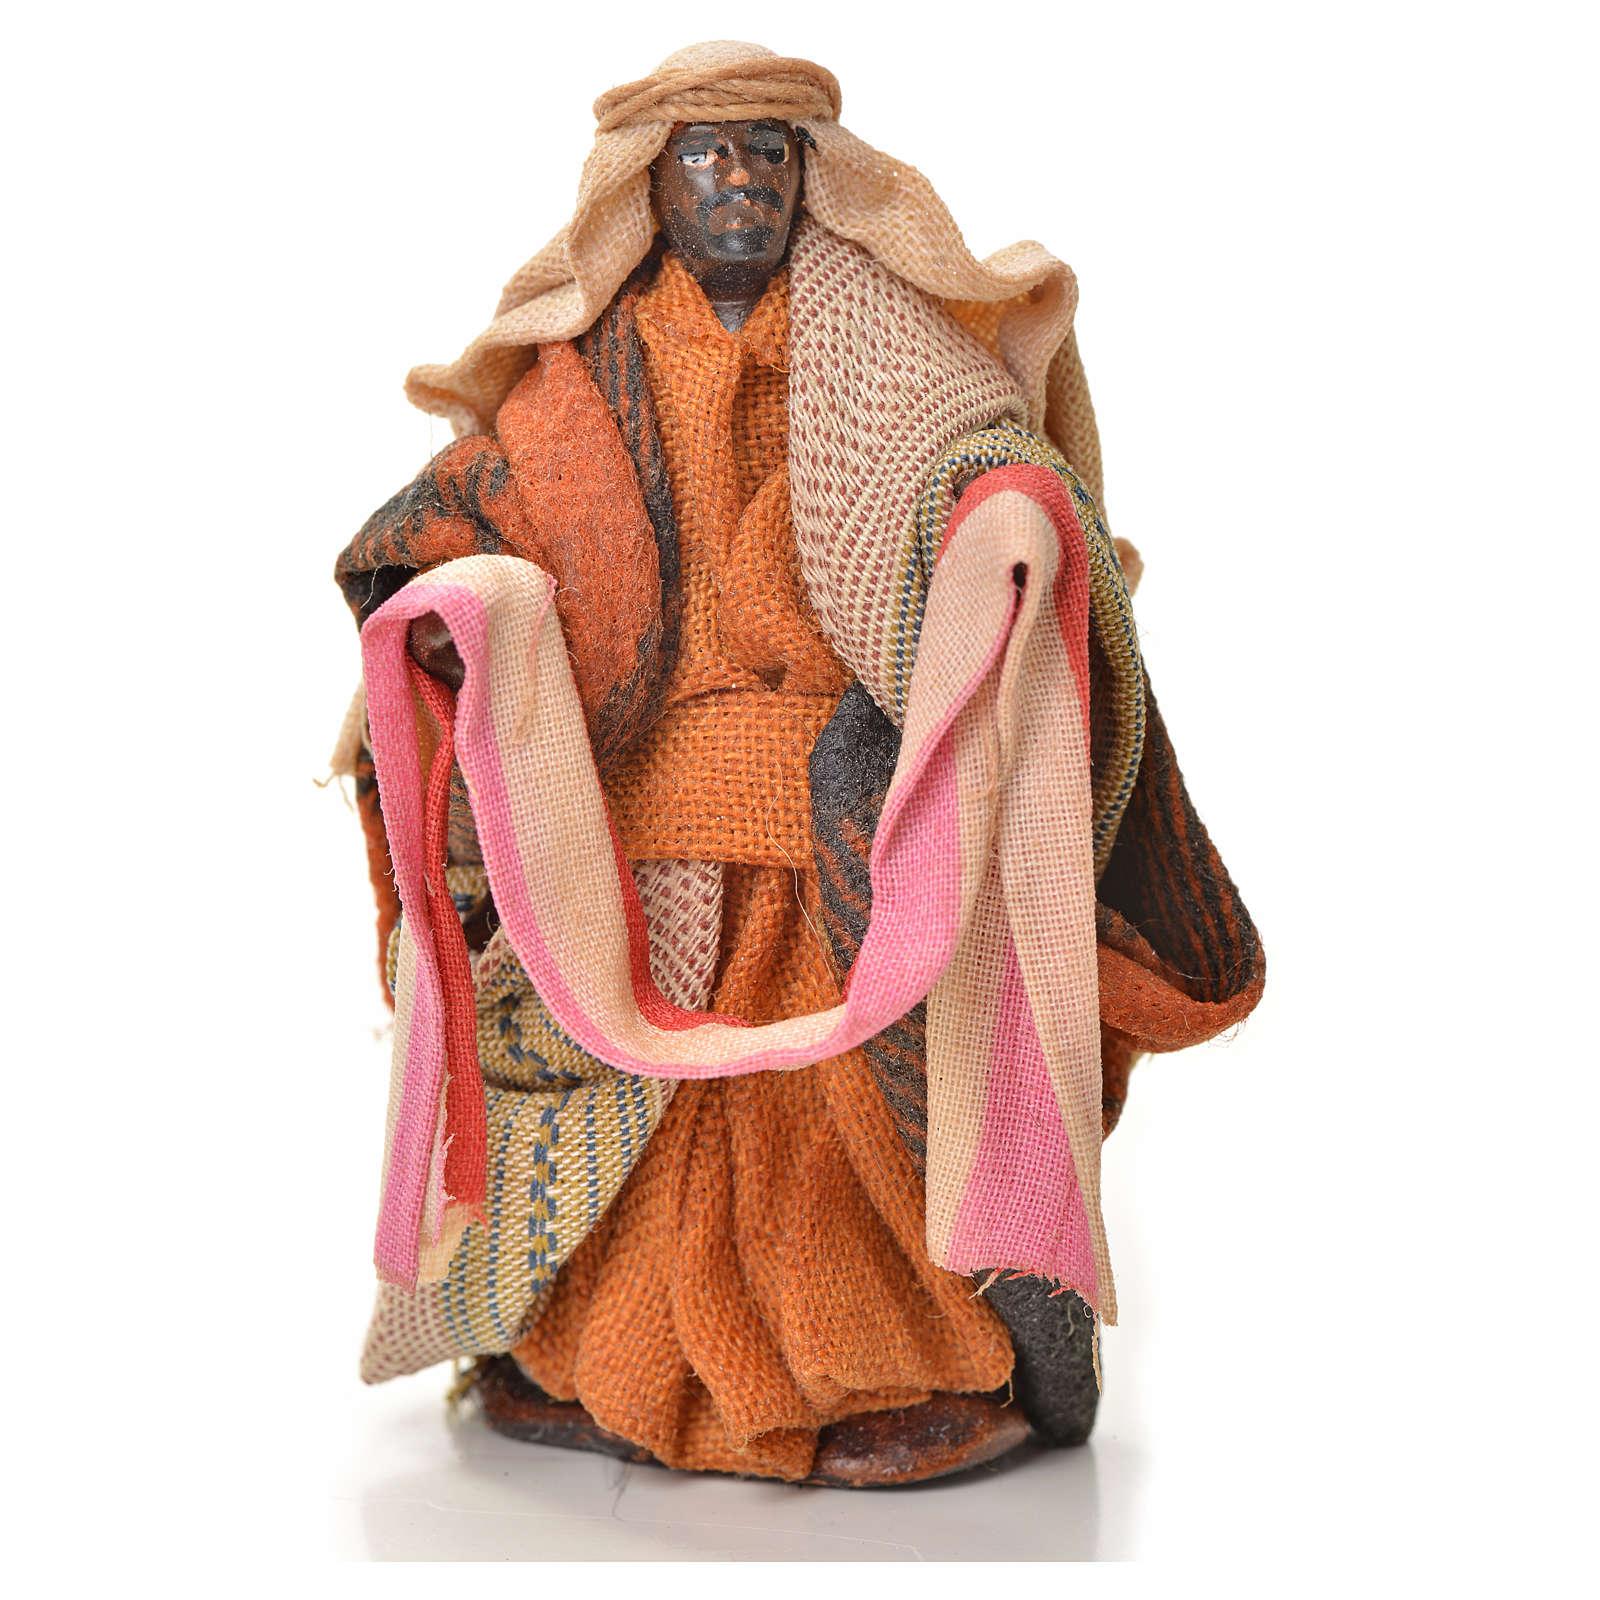 Neapolitan Nativity figurine, cloth seller, 6 cm 4